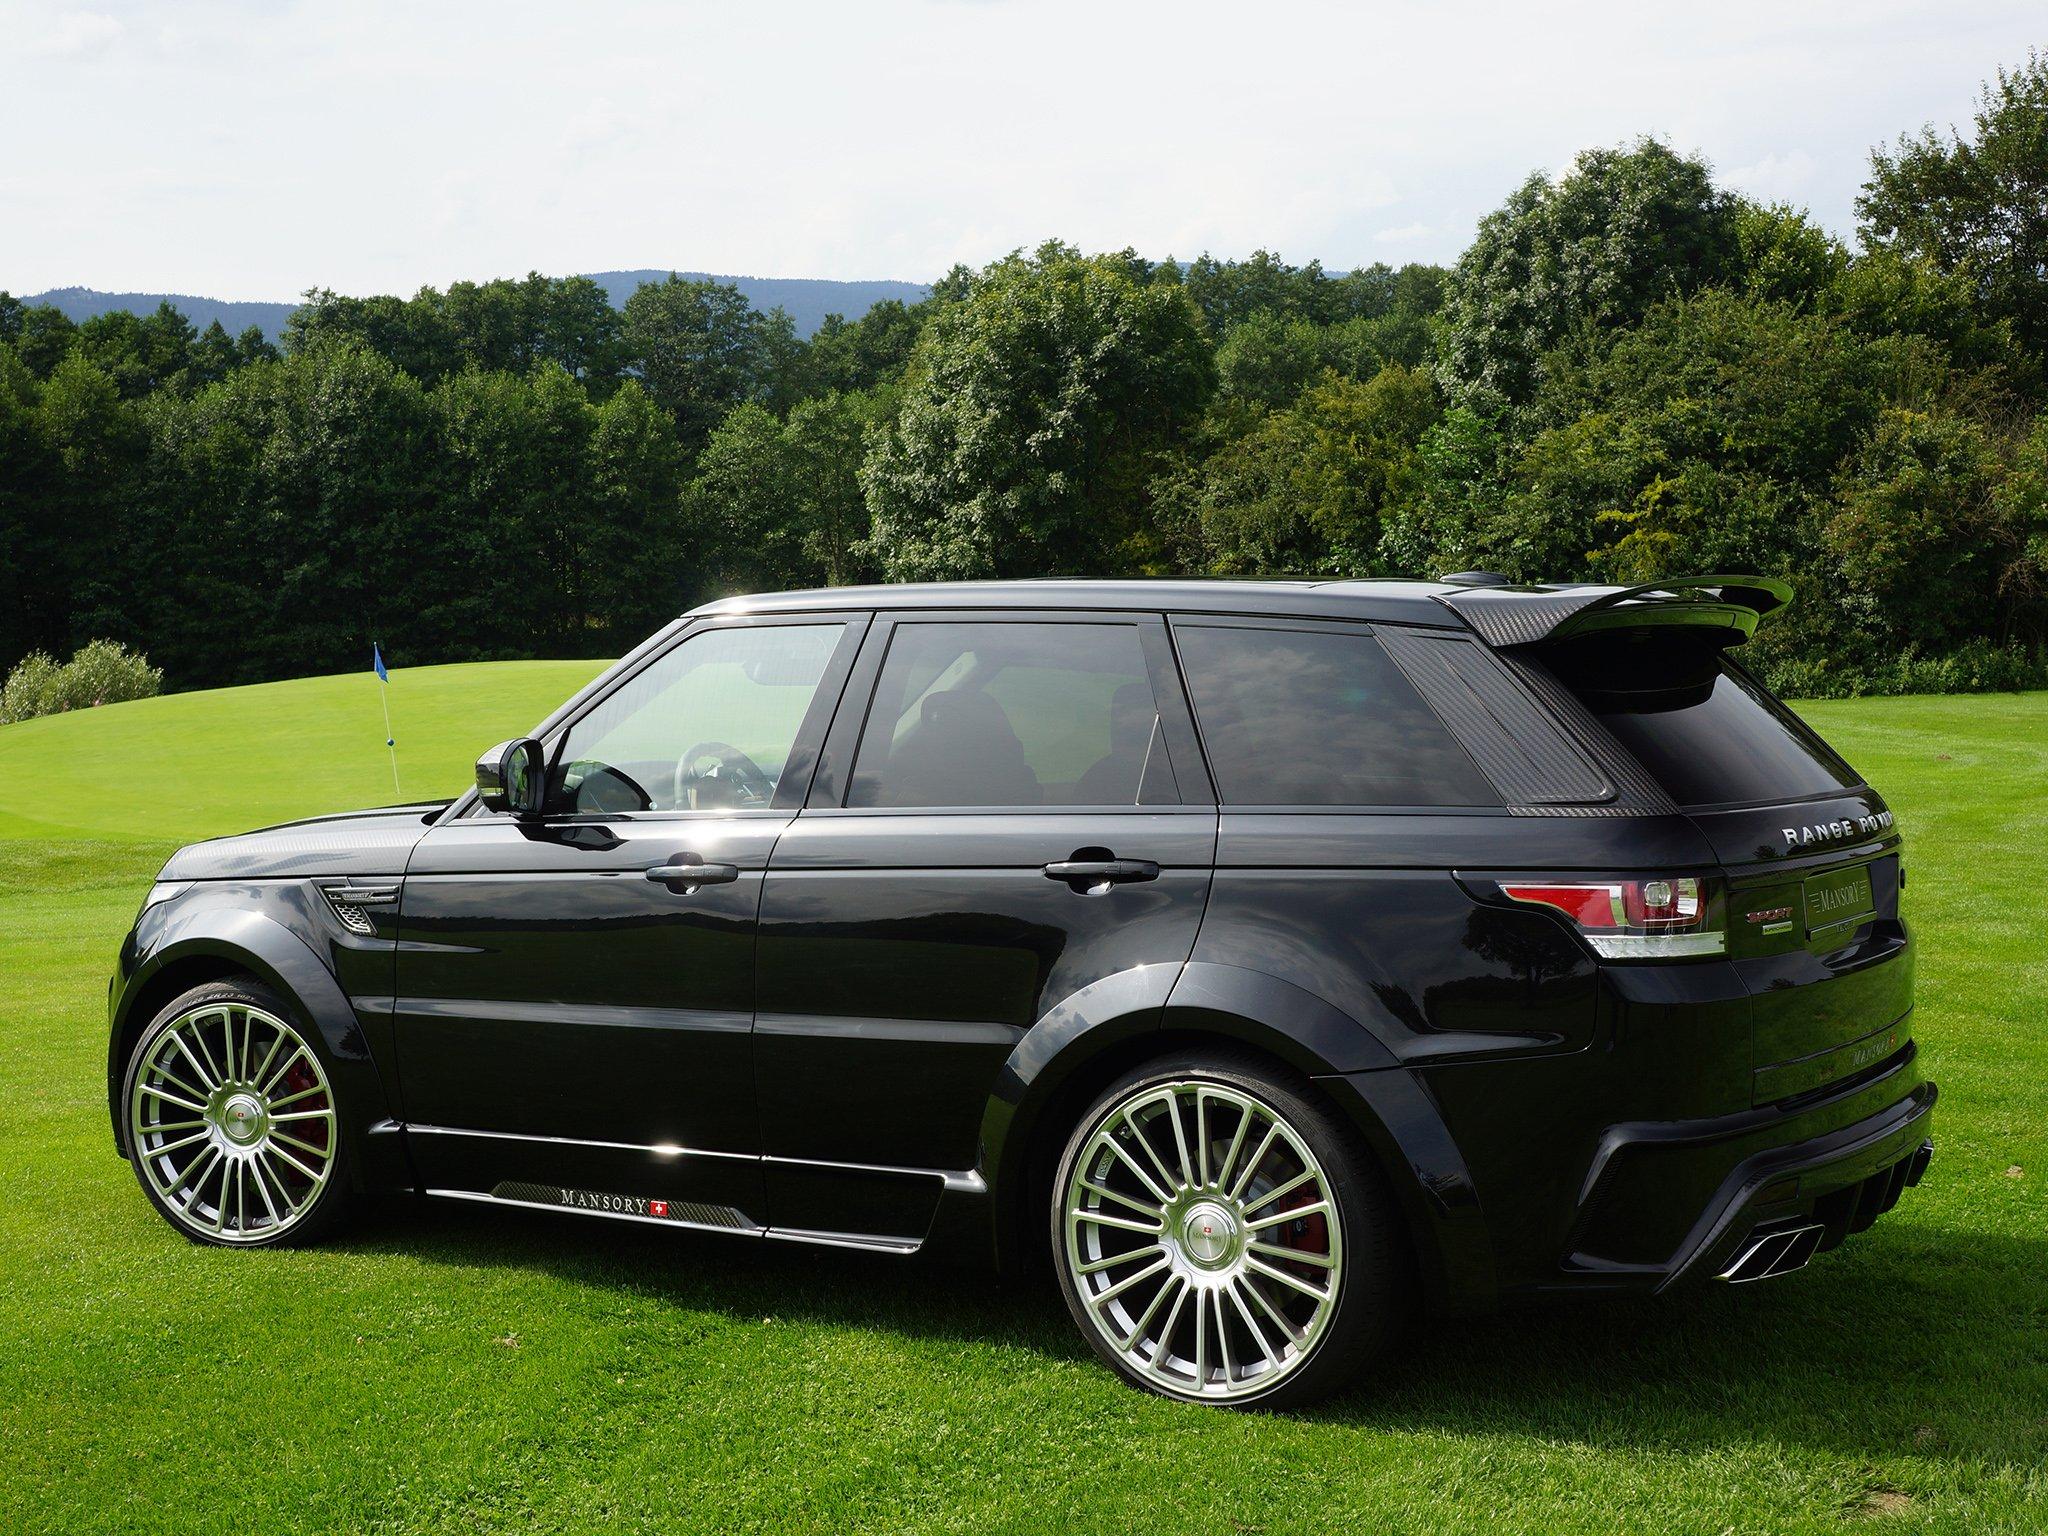 2014 mansory range rover sport tuning luxury suv wallpaper. Black Bedroom Furniture Sets. Home Design Ideas